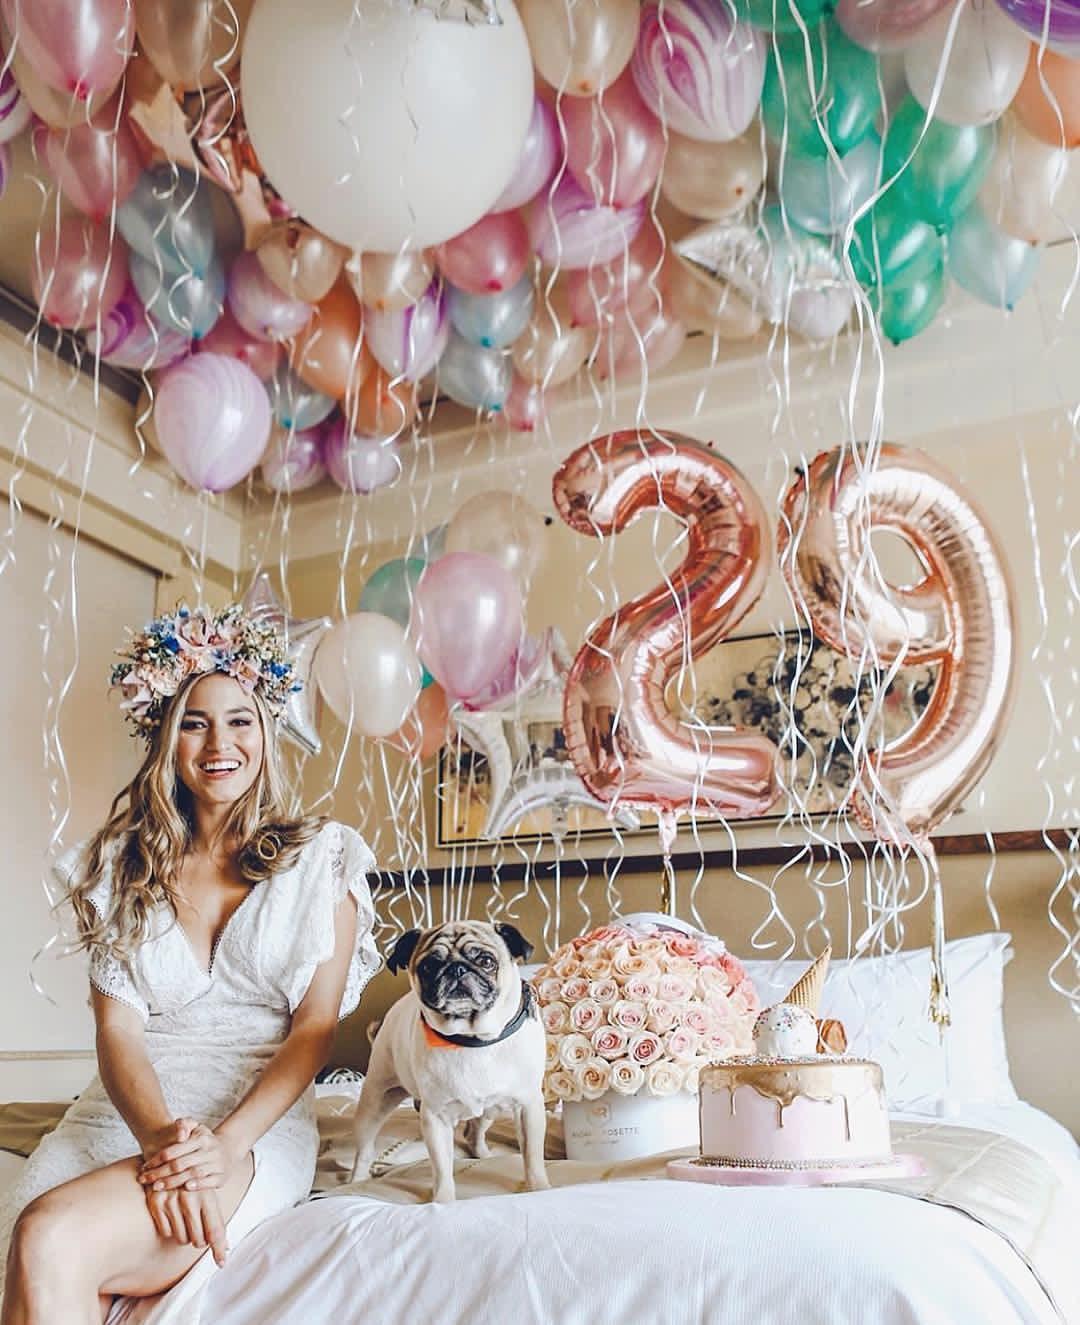 Balloondecor Balloons Birthdaydecor 29thbirthday 29th